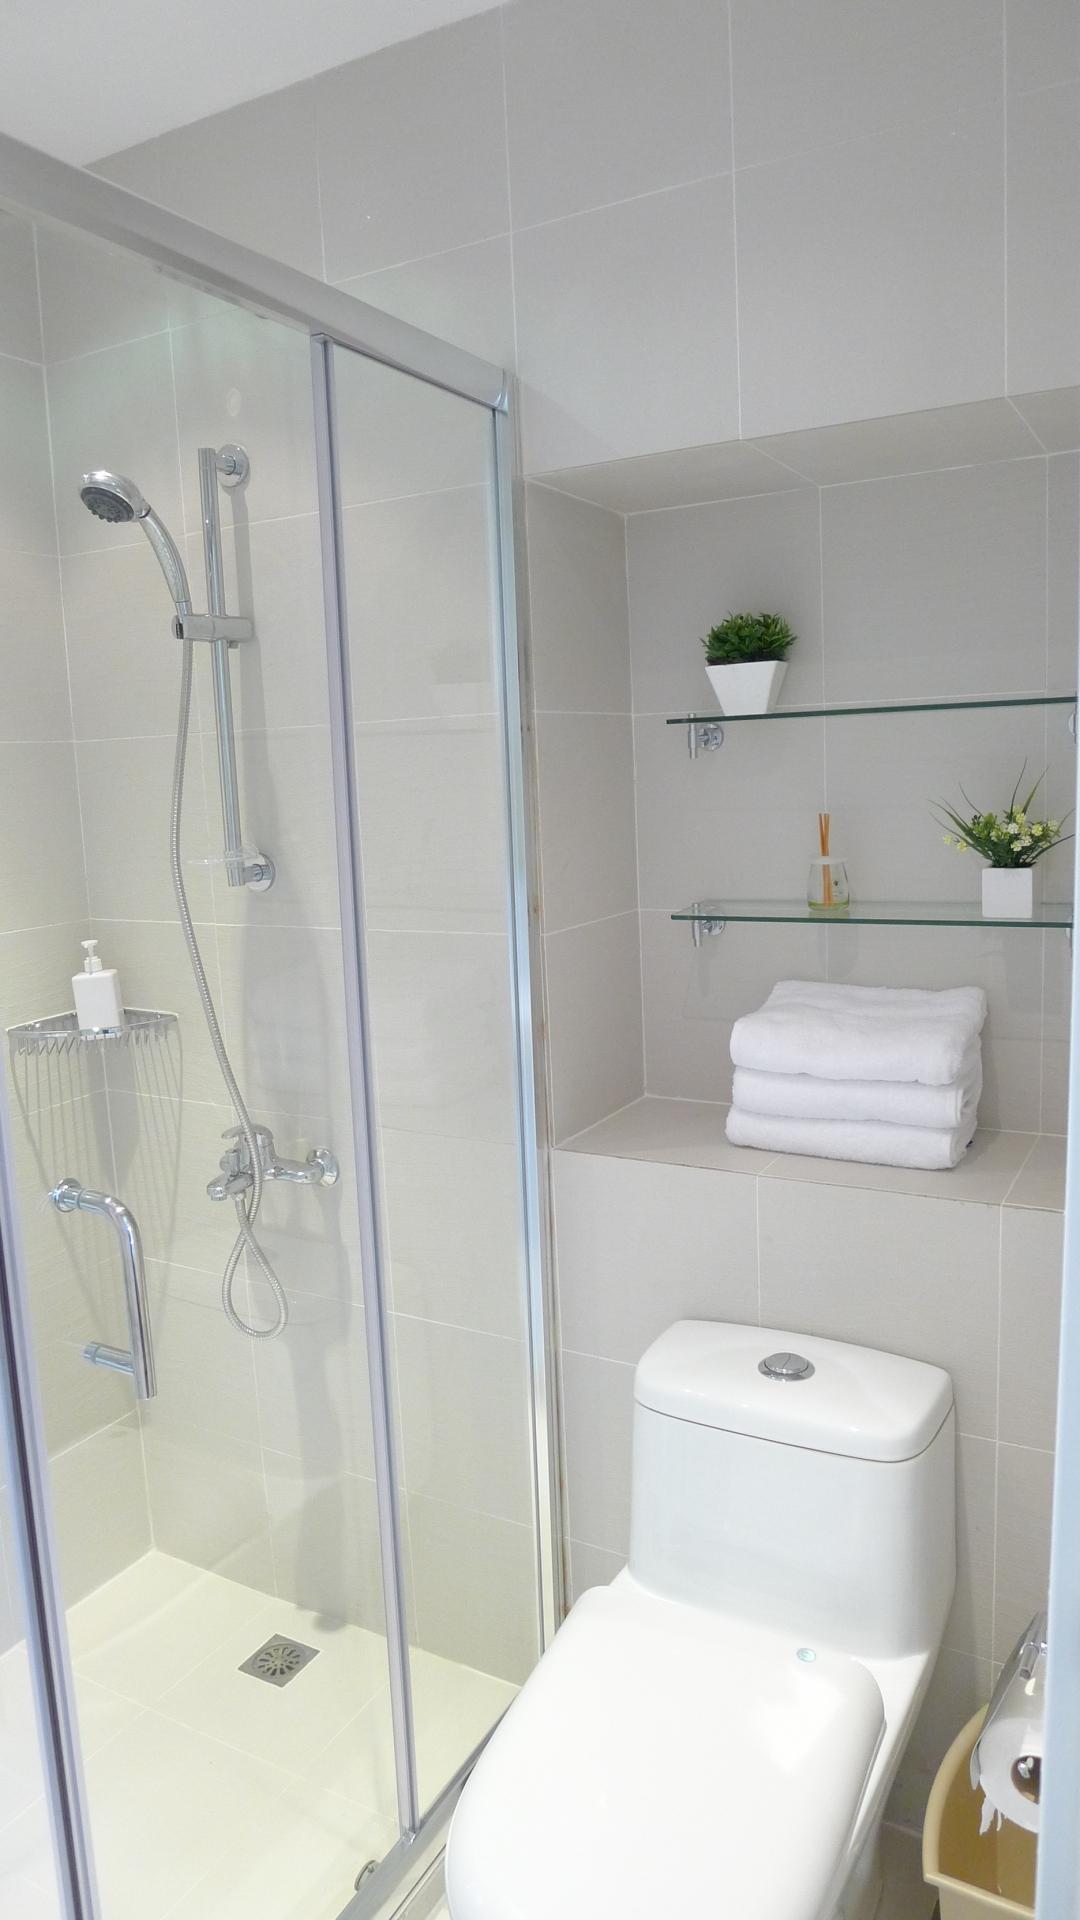 kb-35-master-bathroom